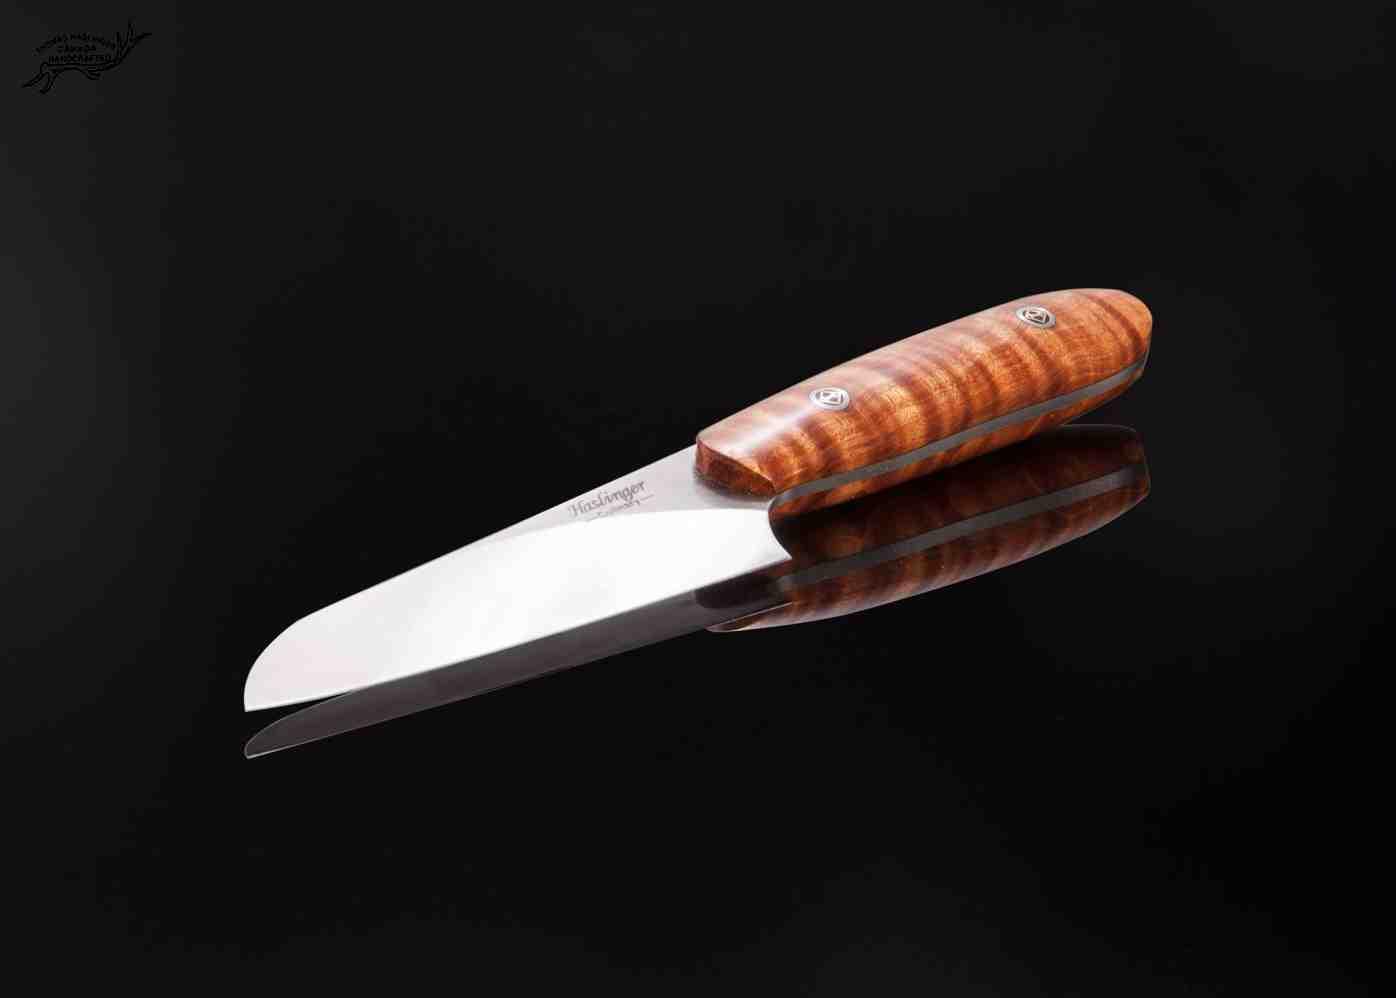 Santuko paring knife handled in stabilized fiddleback maple